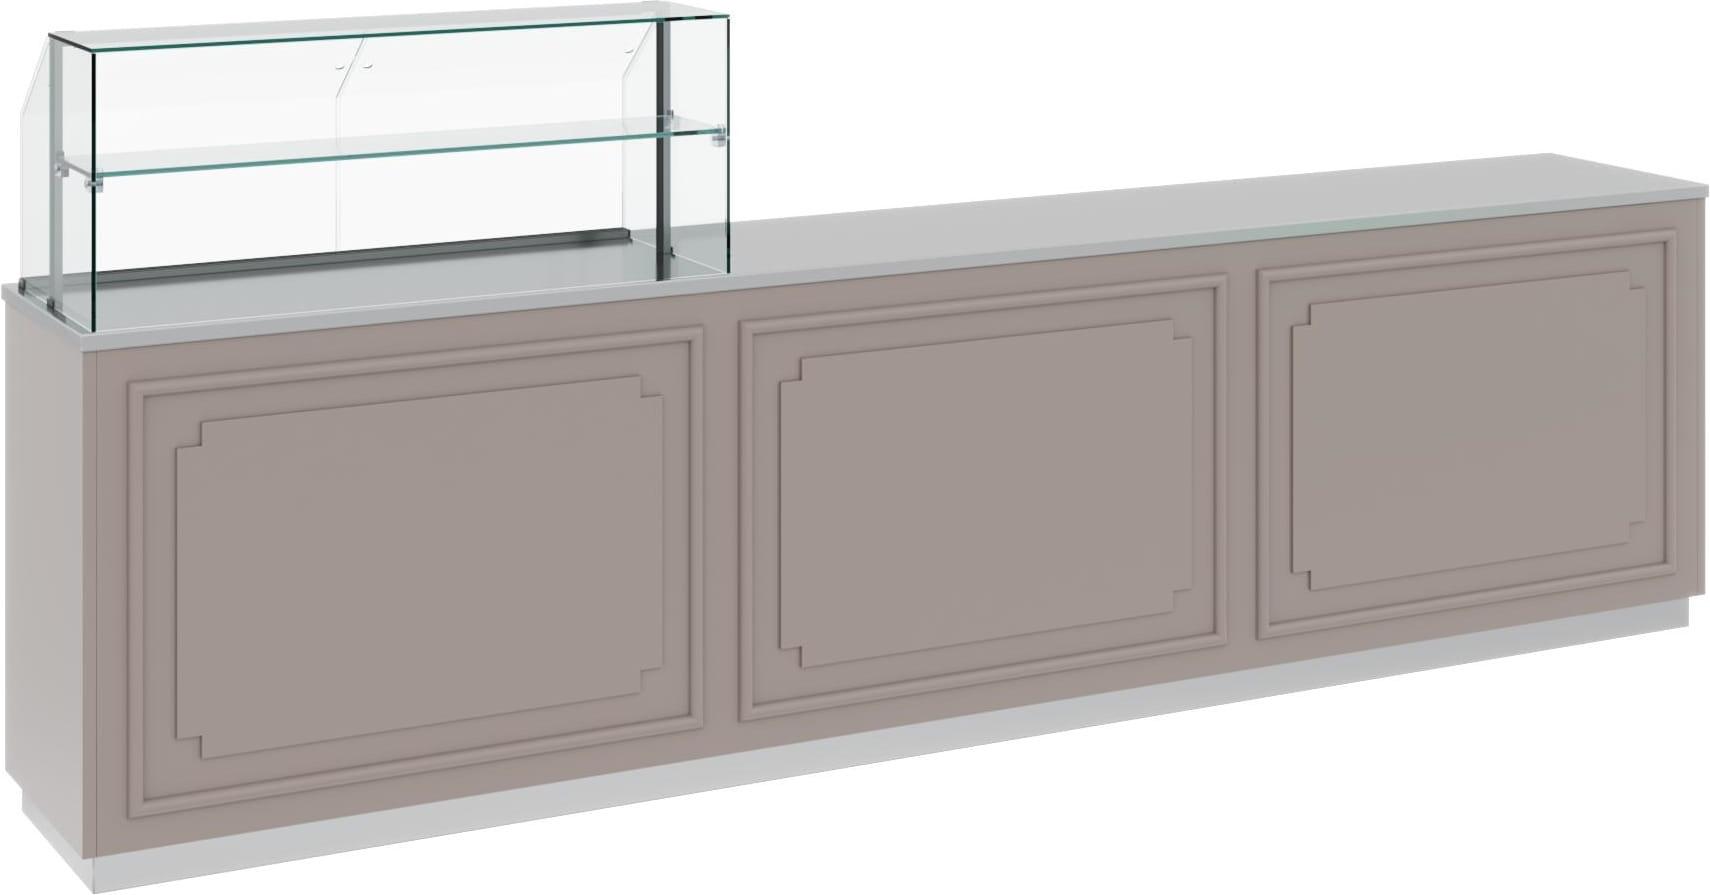 Нейтральная витрина CARBOMA OMI AC40N 1.25-11 - 1